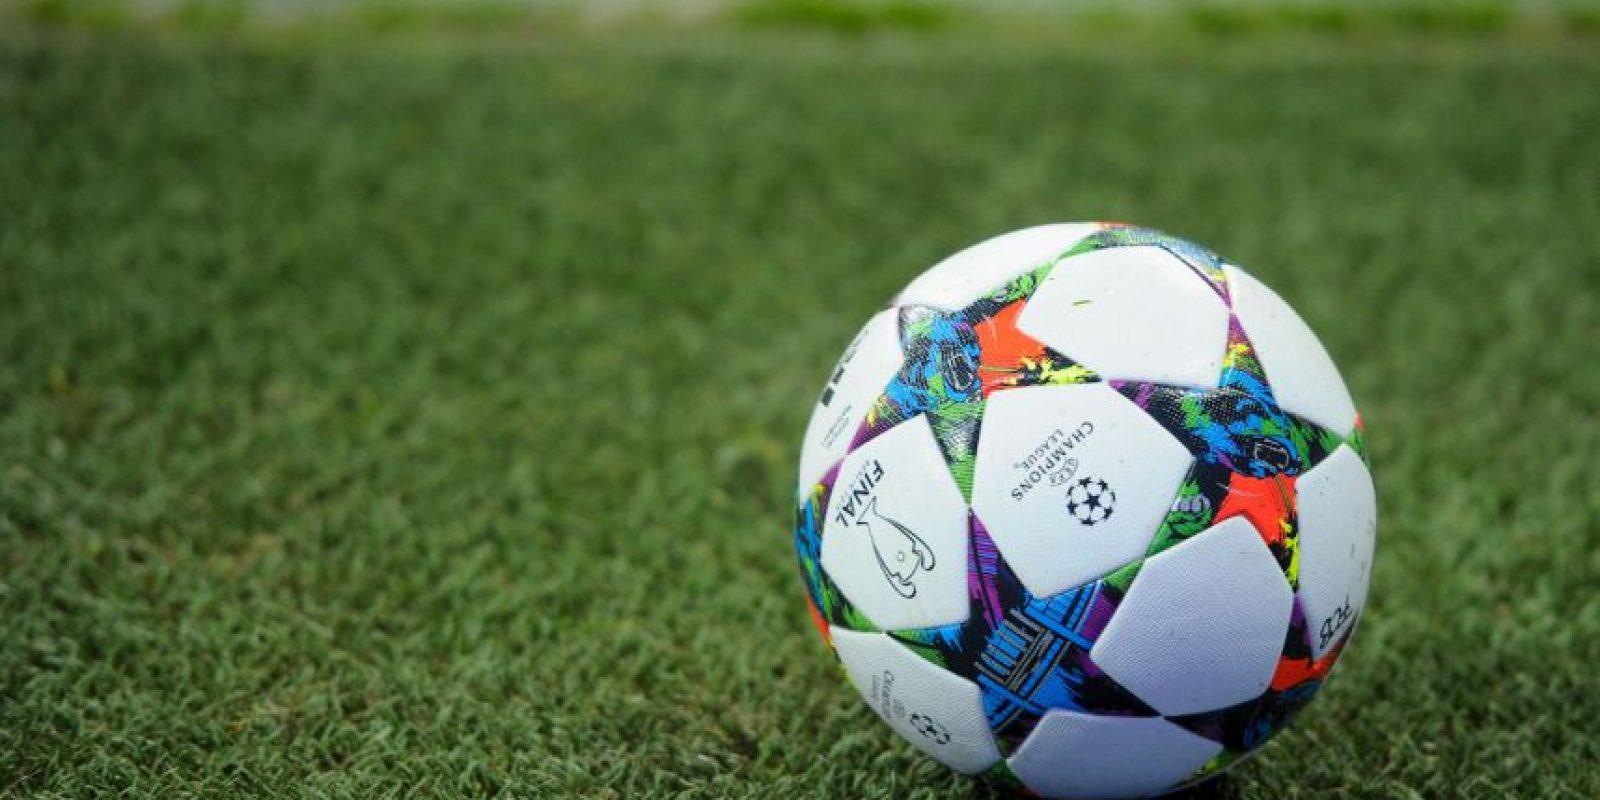 Arranca la fase de grupos de la Champions League. Foto:Getty Images